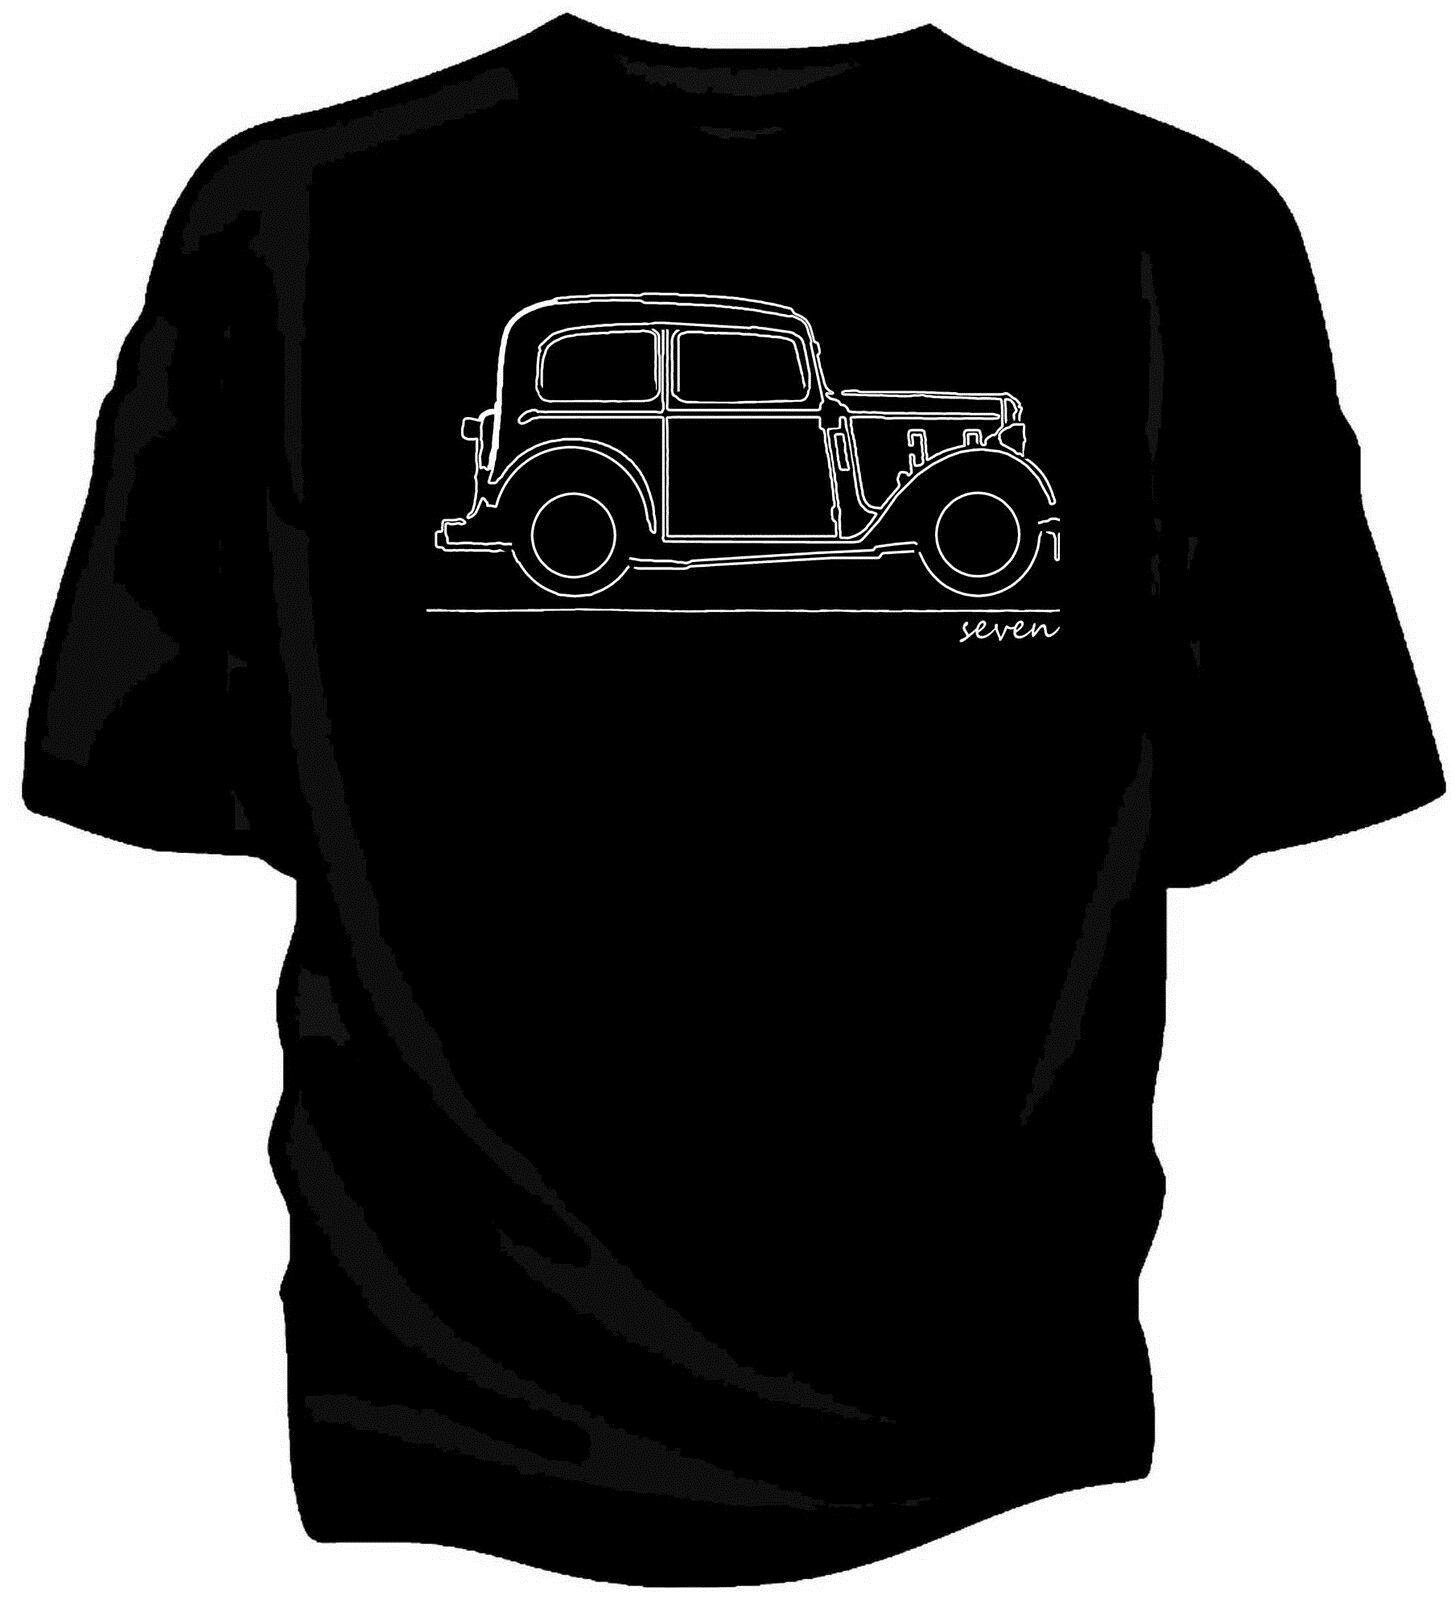 Ursprüngliche Kunst-Skizze T-Shirt - Austin Seven 7